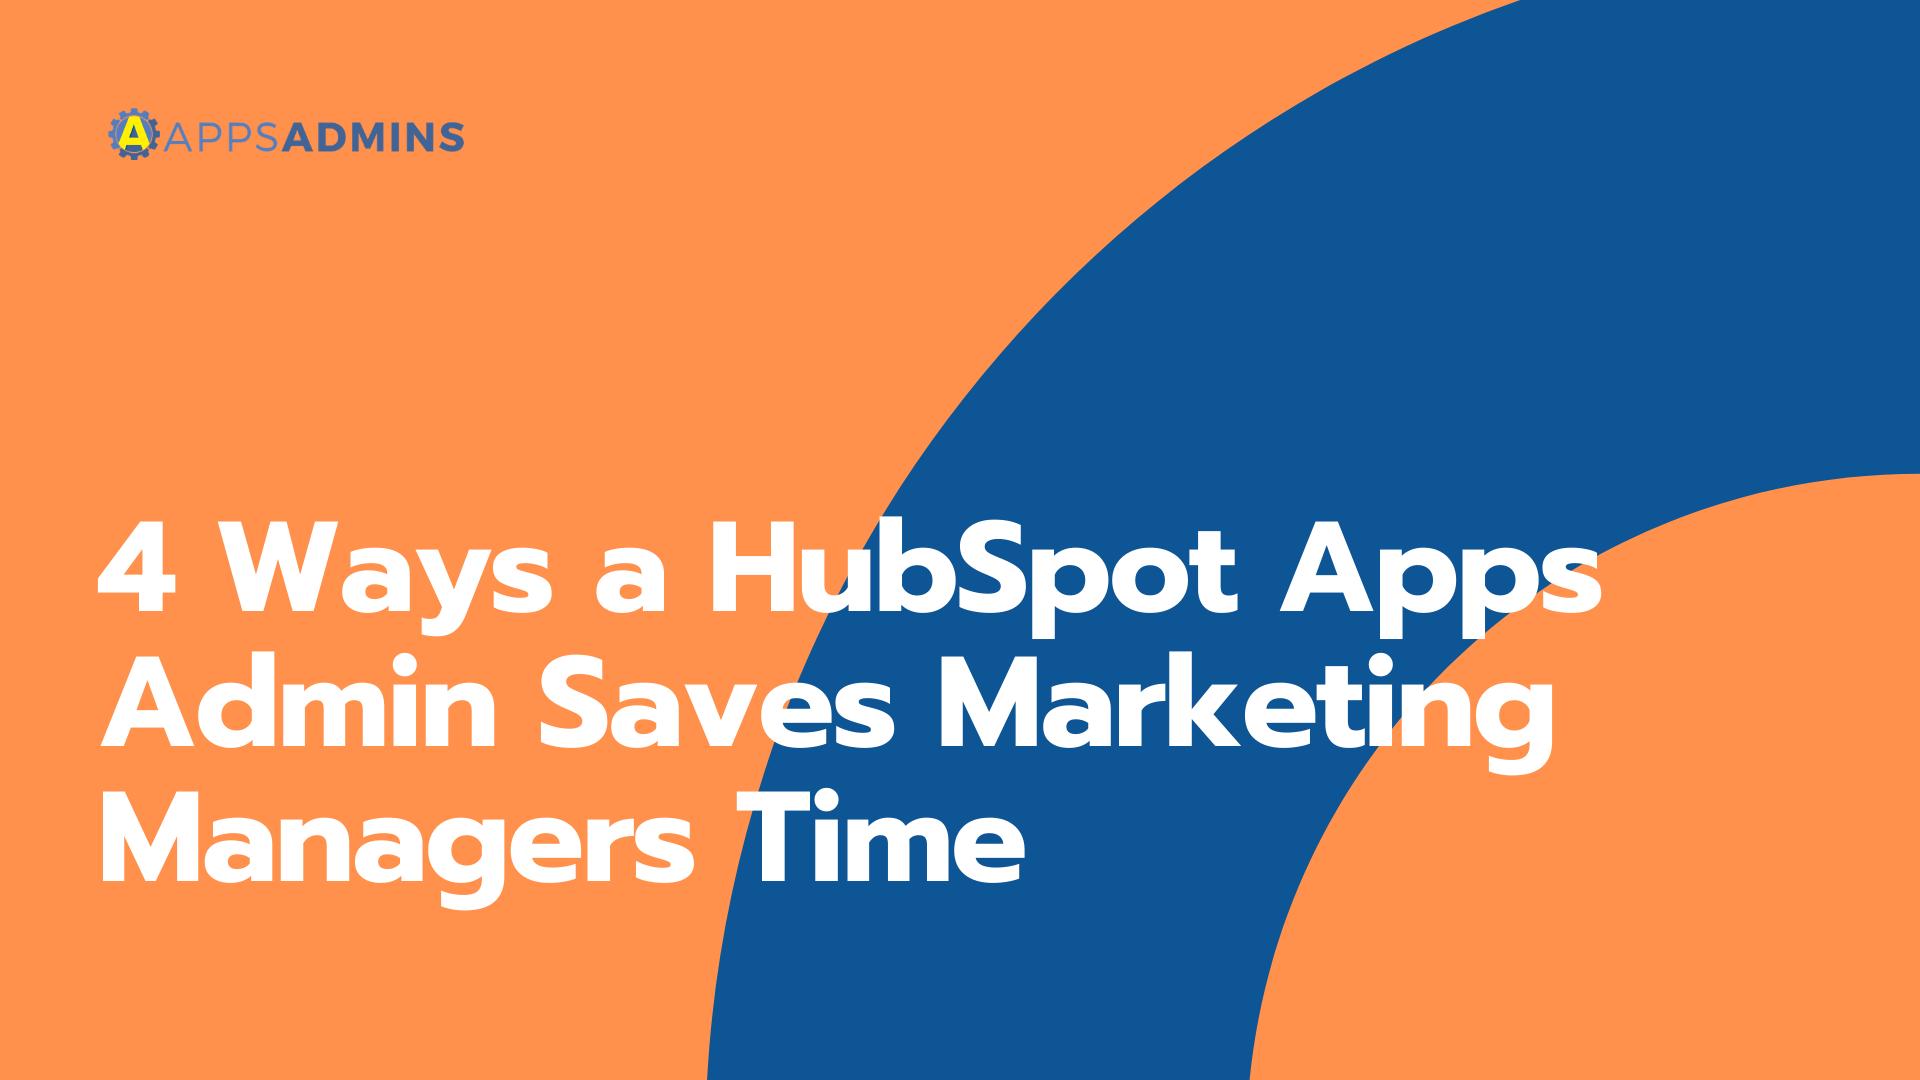 HubSpot_Apps_Admin